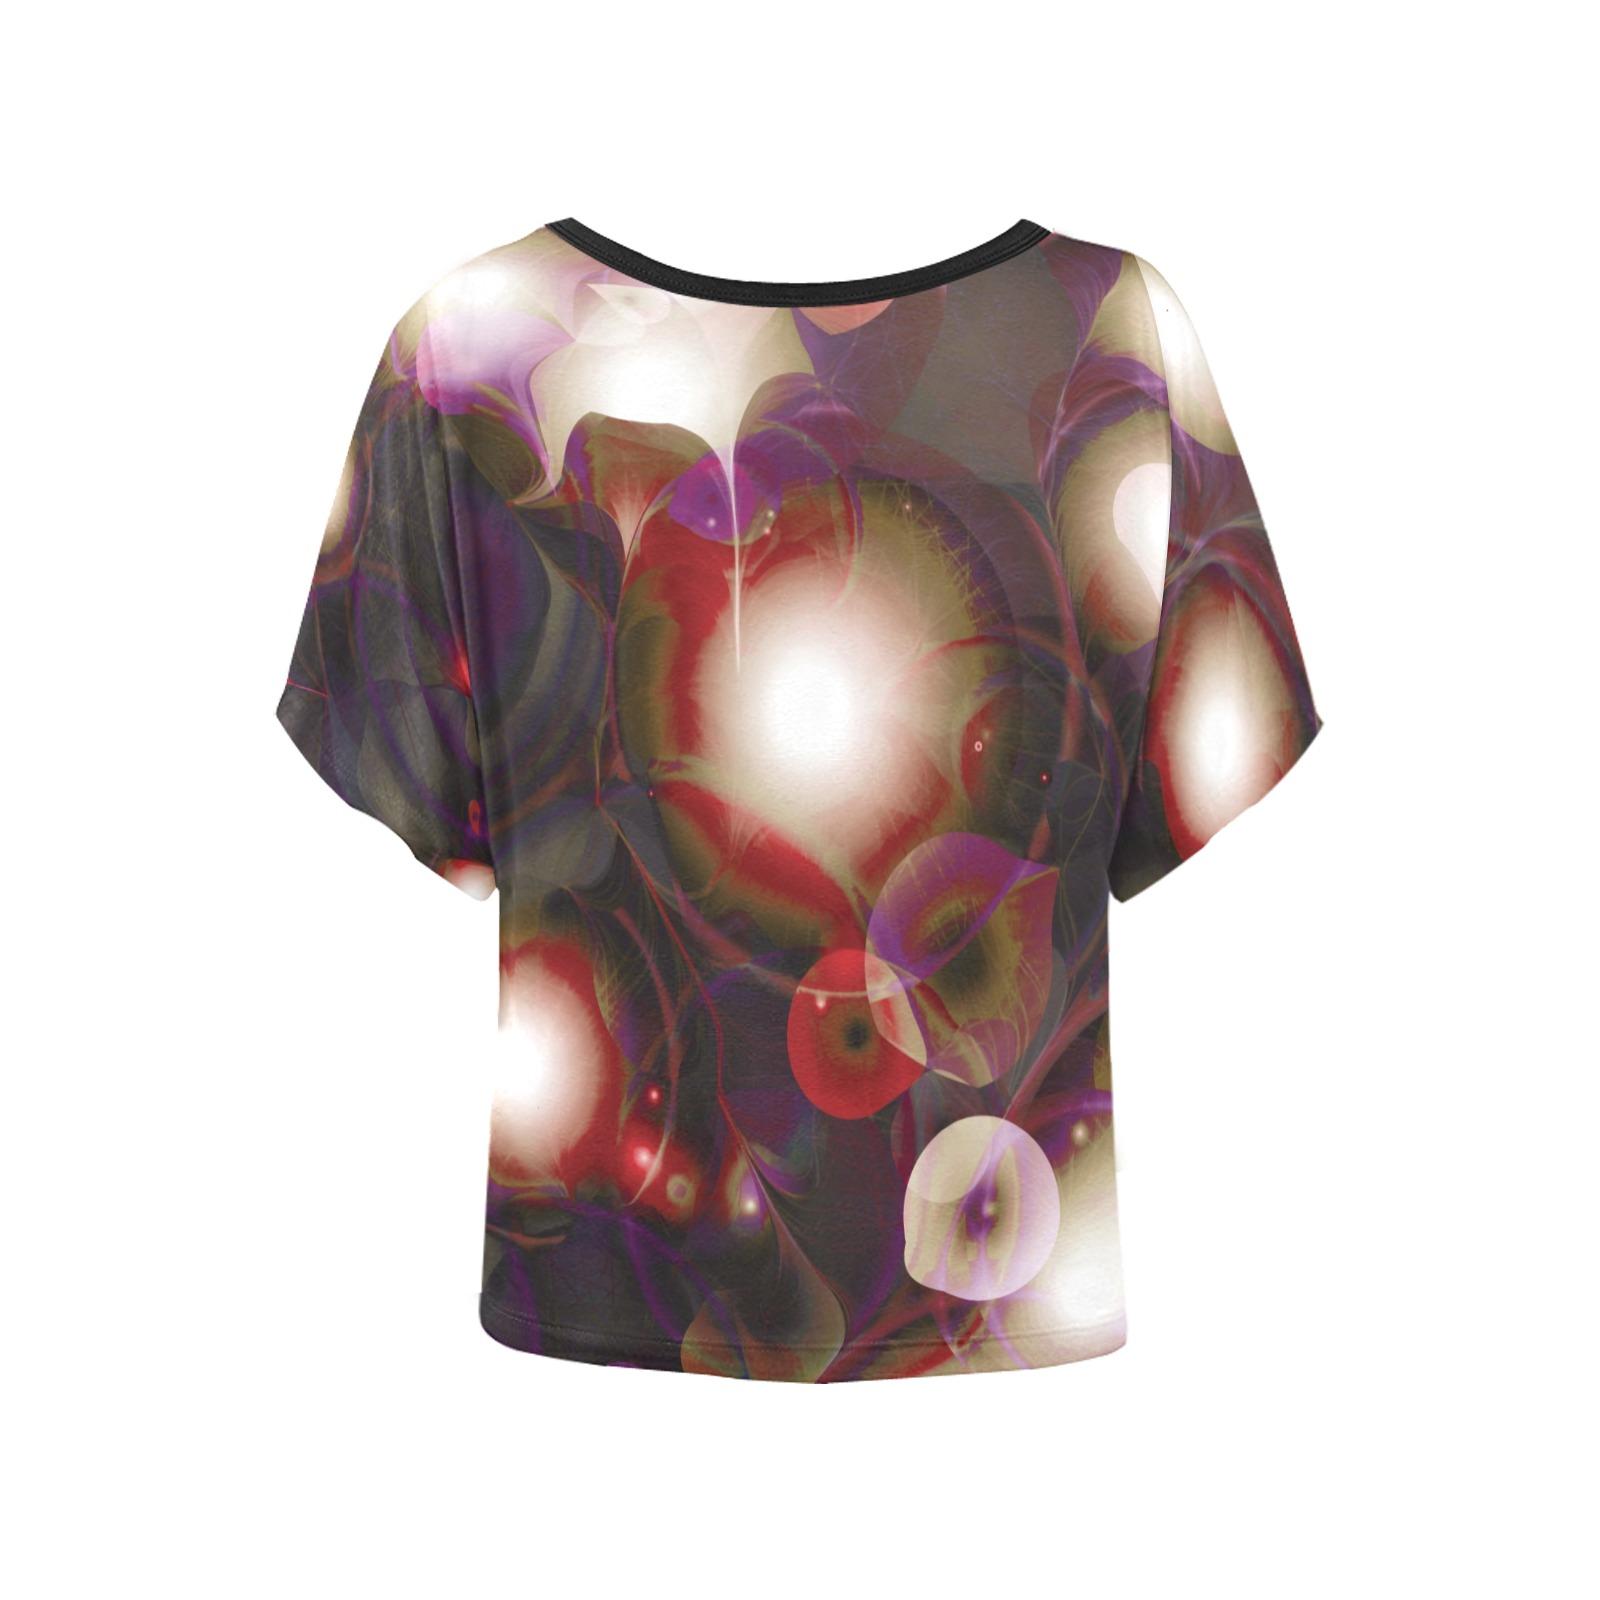 melting bubbles7 Women's Batwing-Sleeved Blouse T shirt (Model T44)